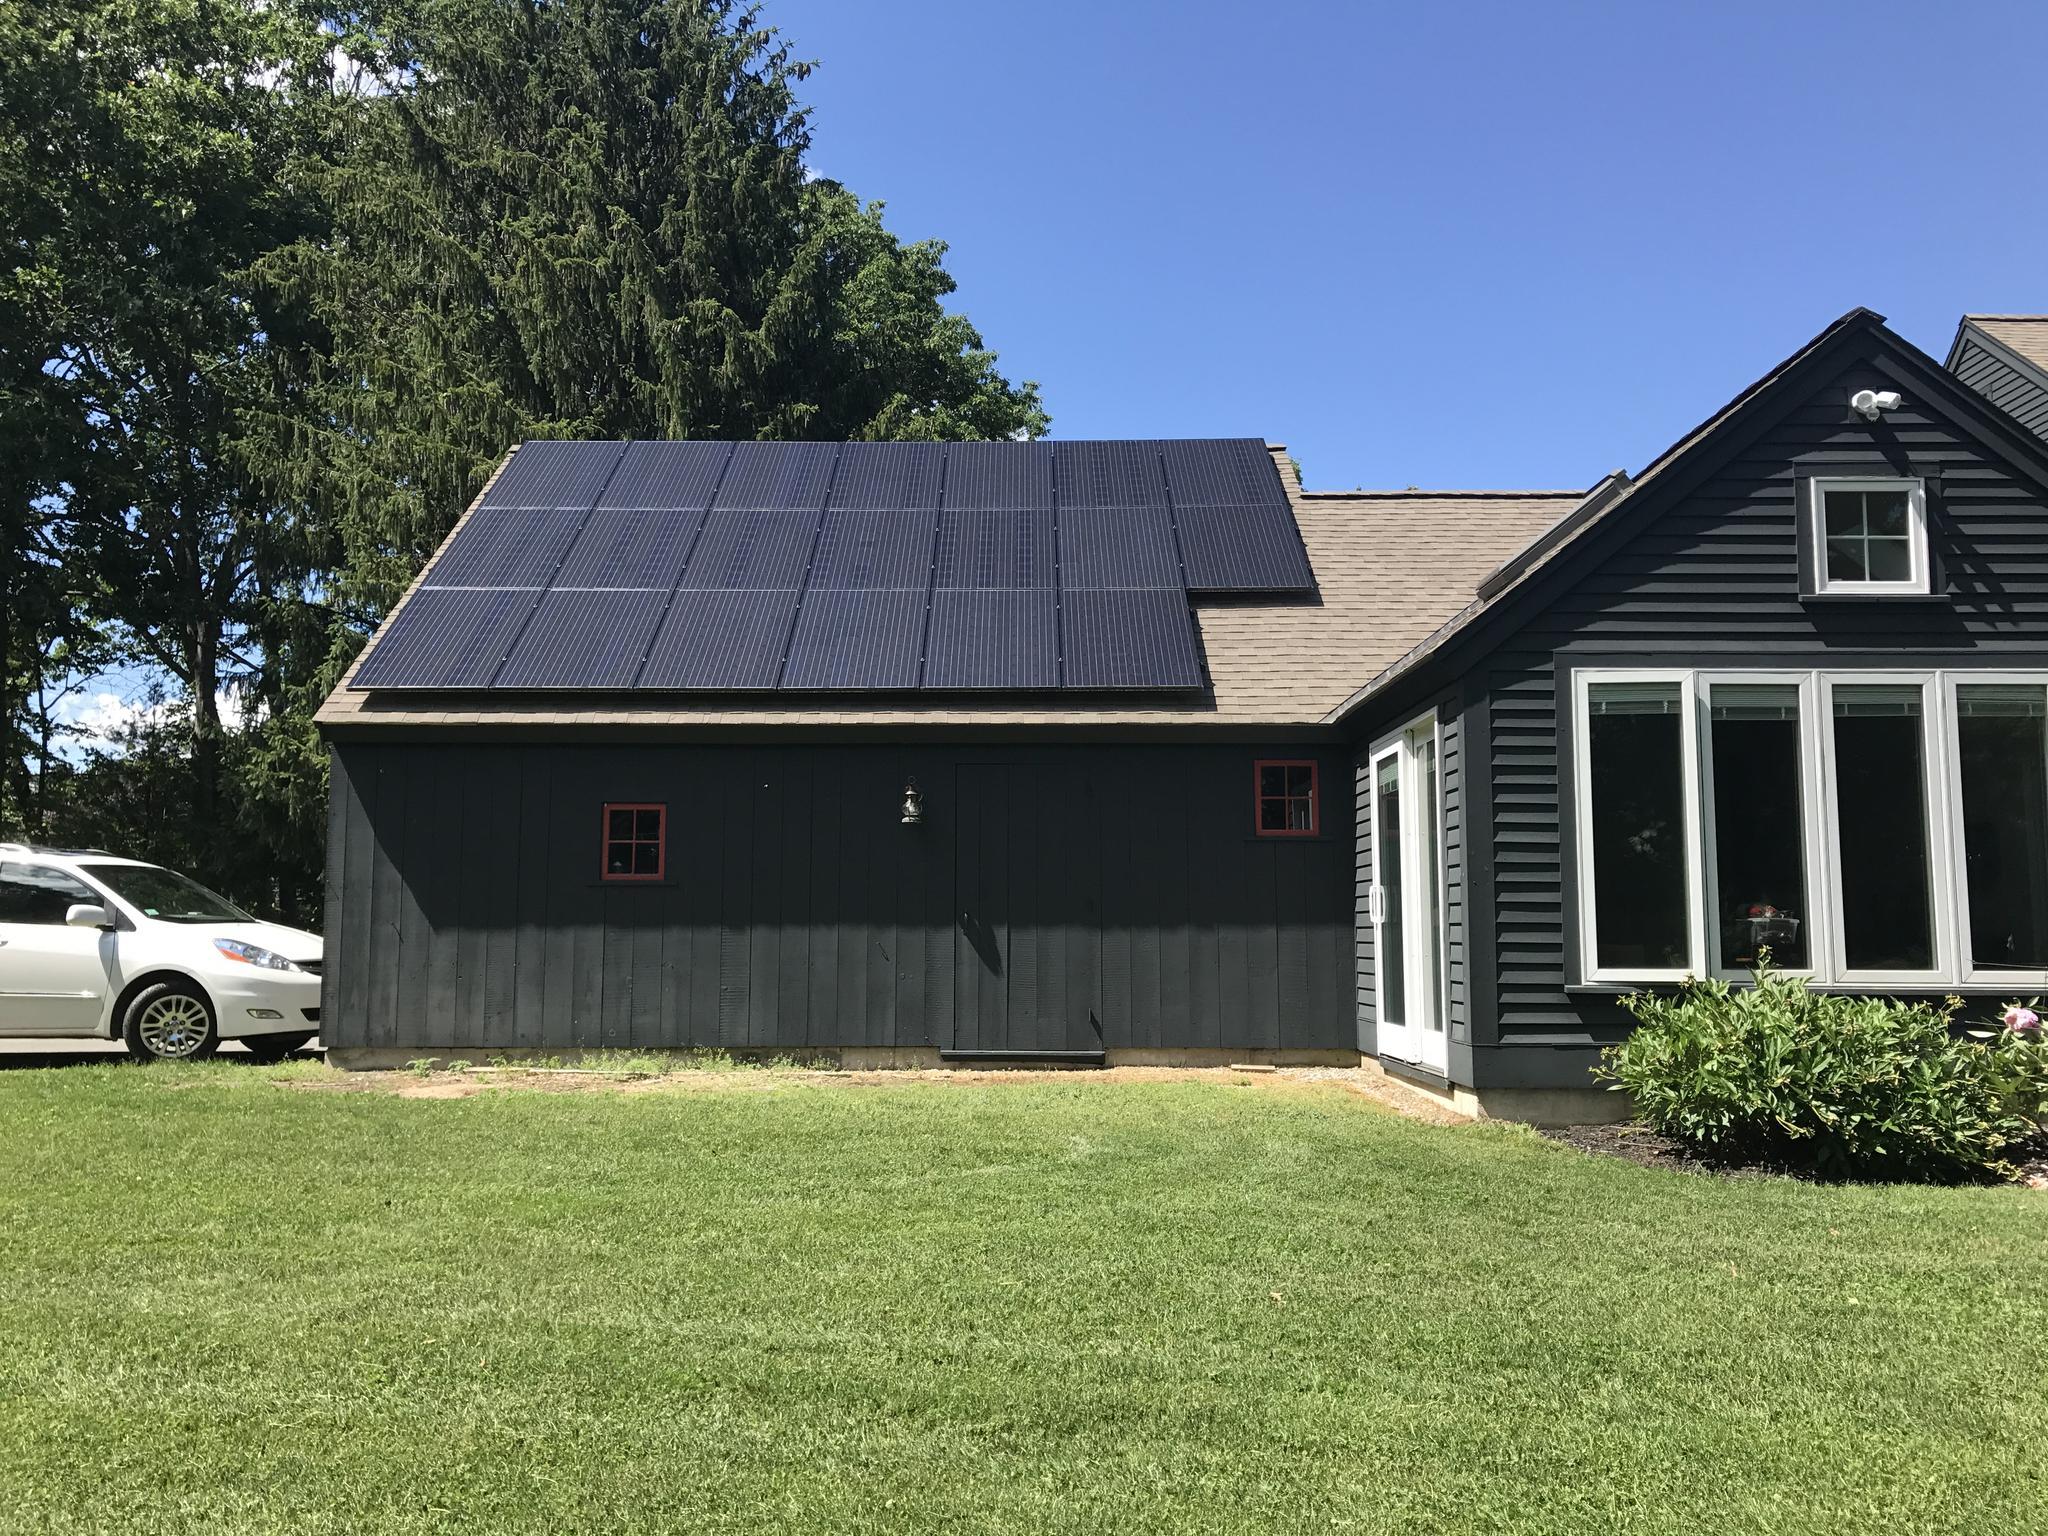 Boston Solar Profile Amp Reviews 2019 Energysage